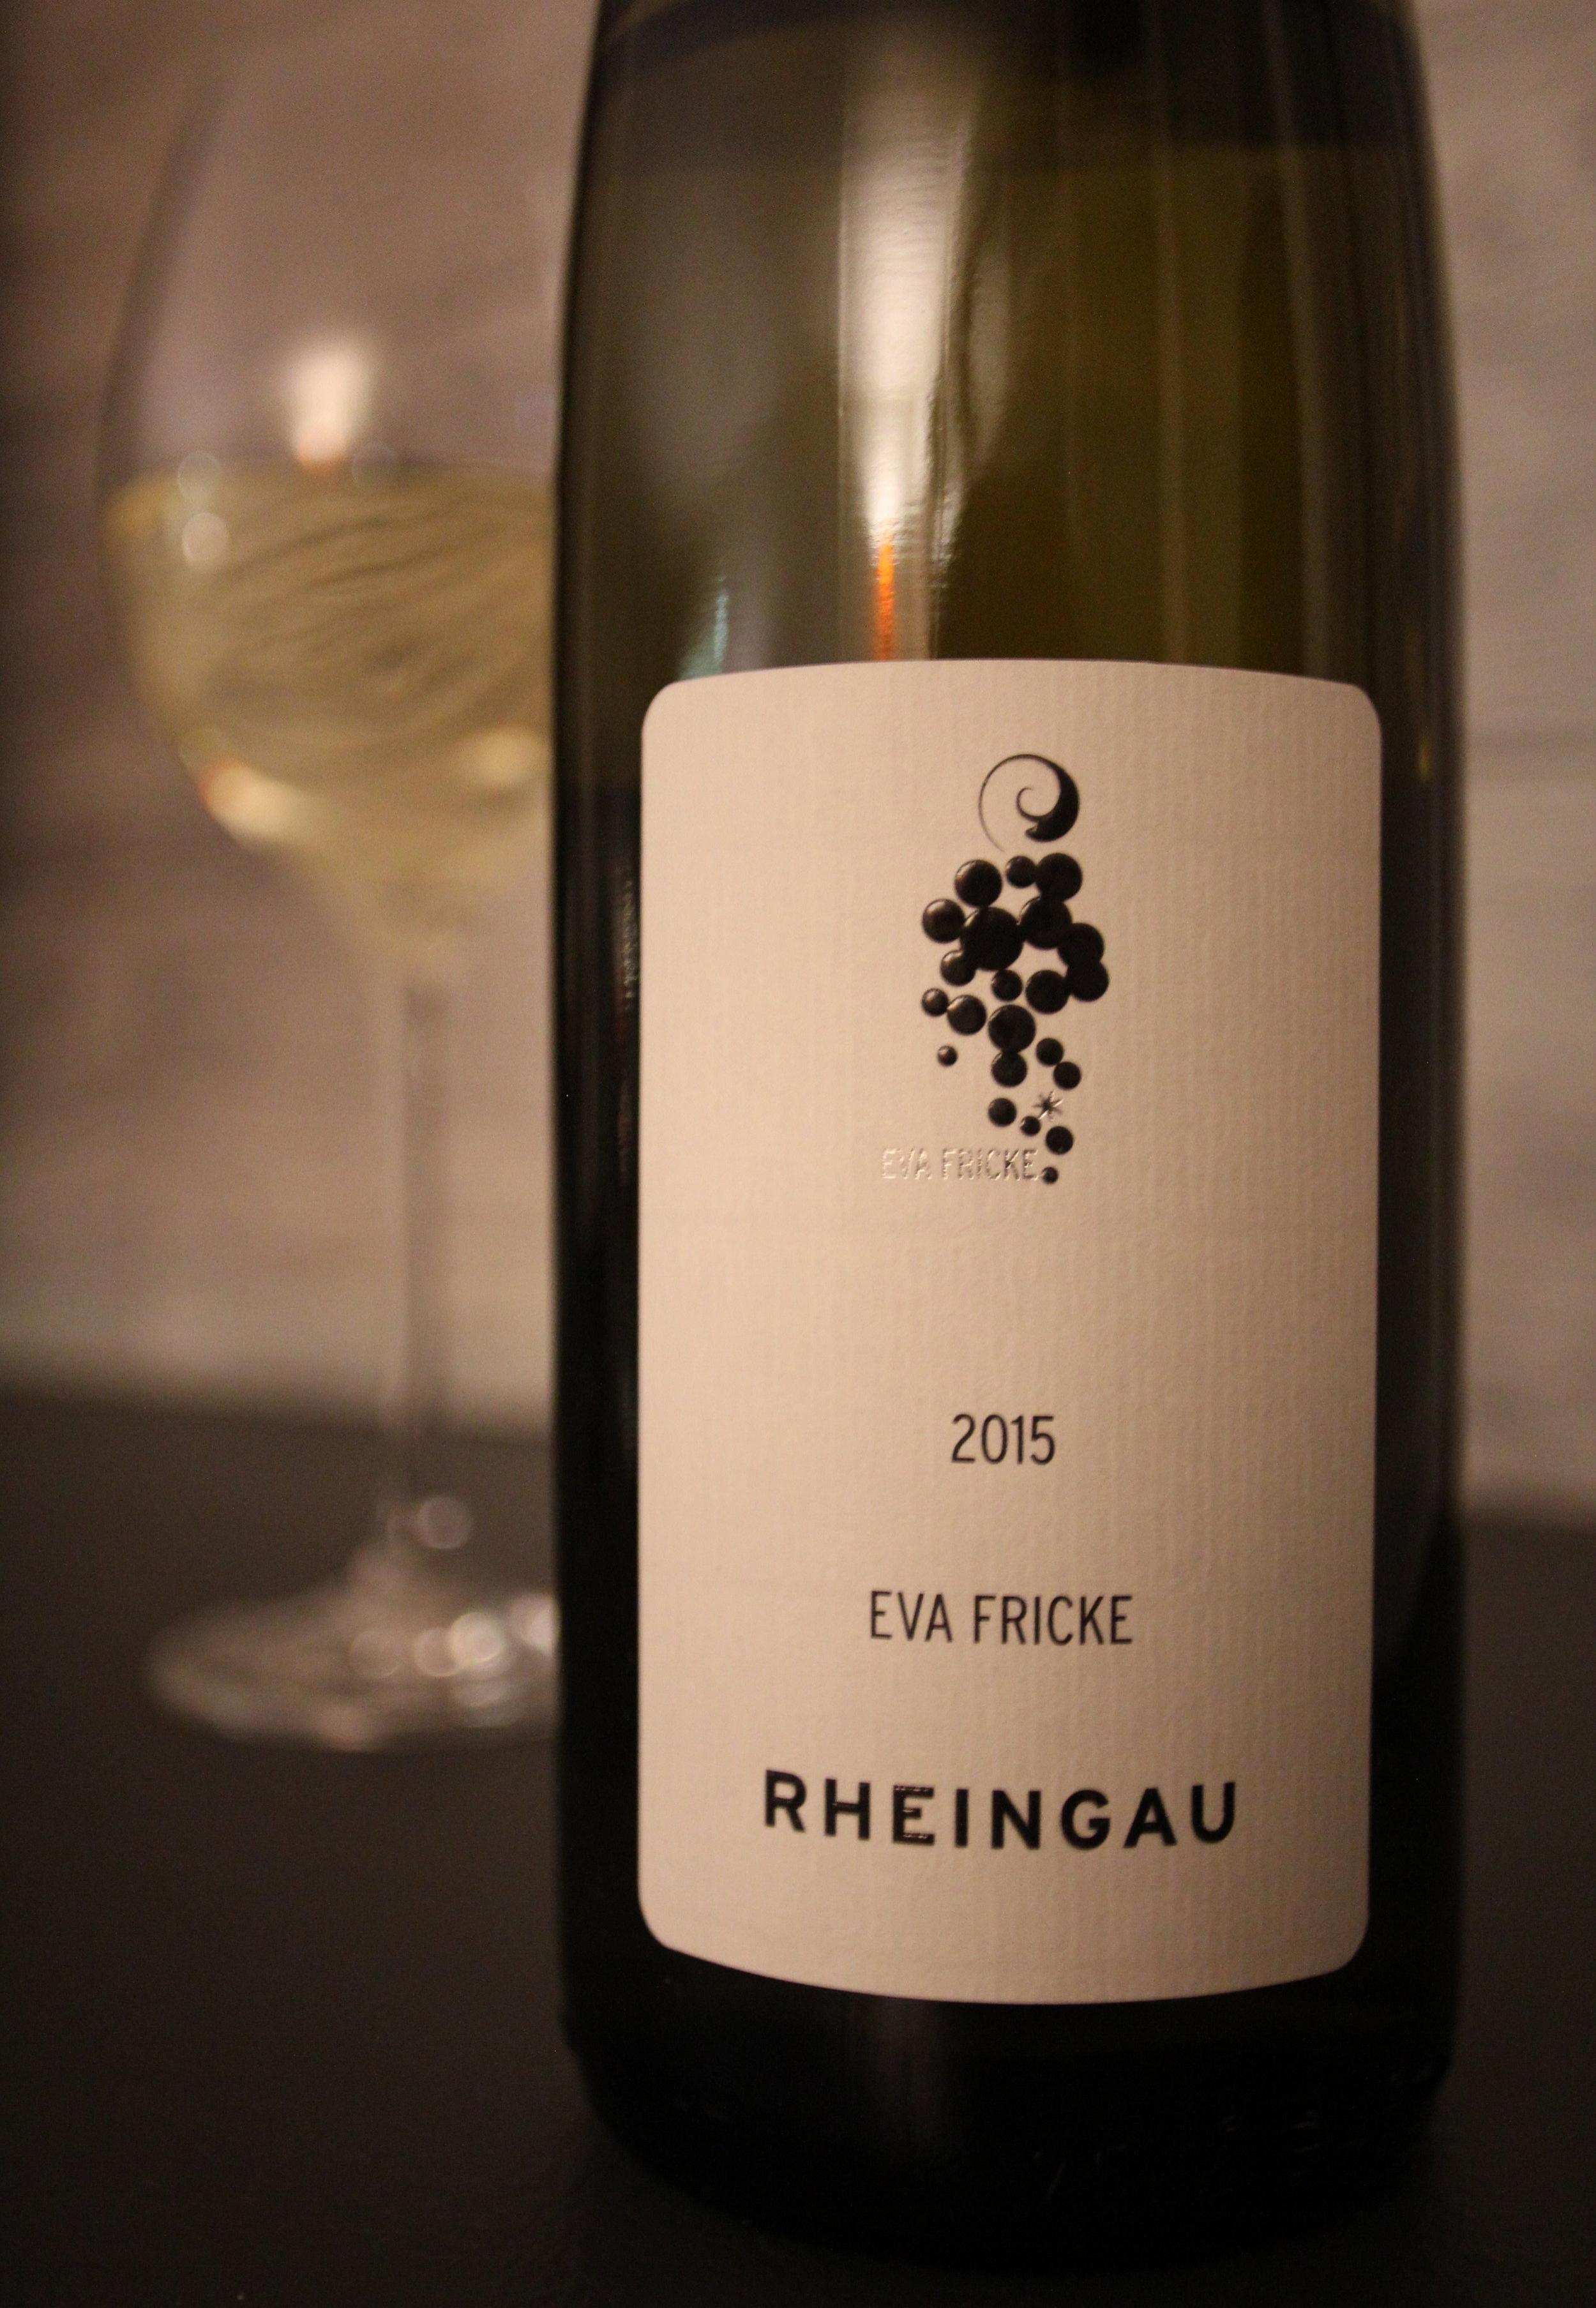 Eva Fricke Rheingau Estate Riesling 2015: $19.99